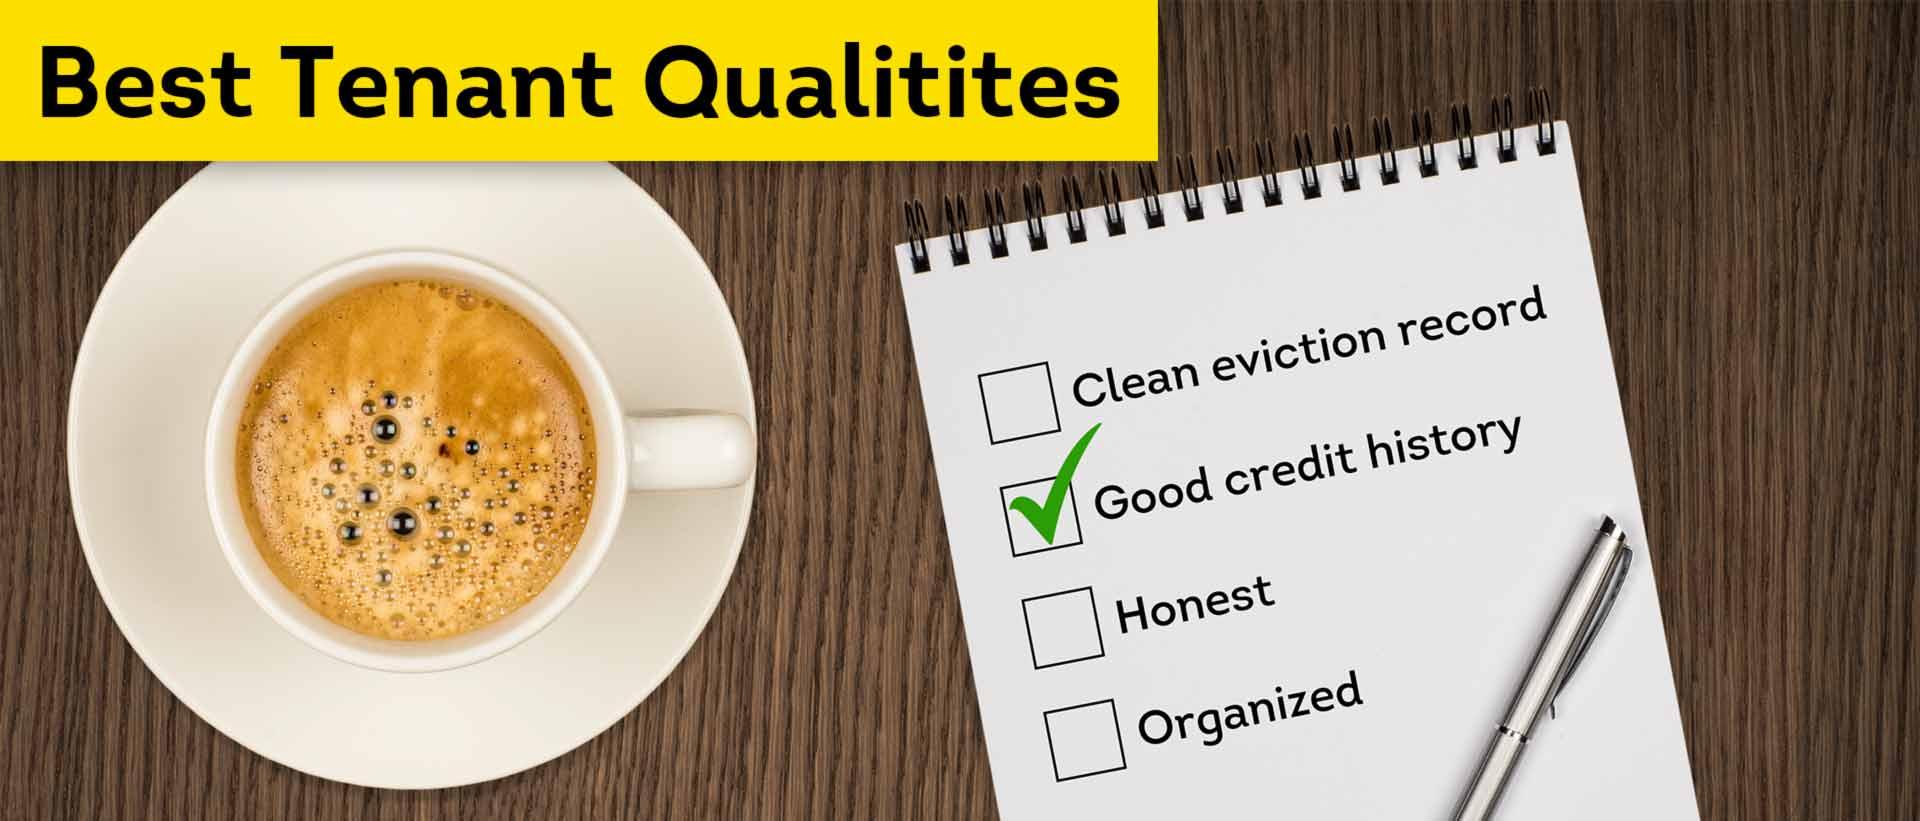 Best Tenant Qualities